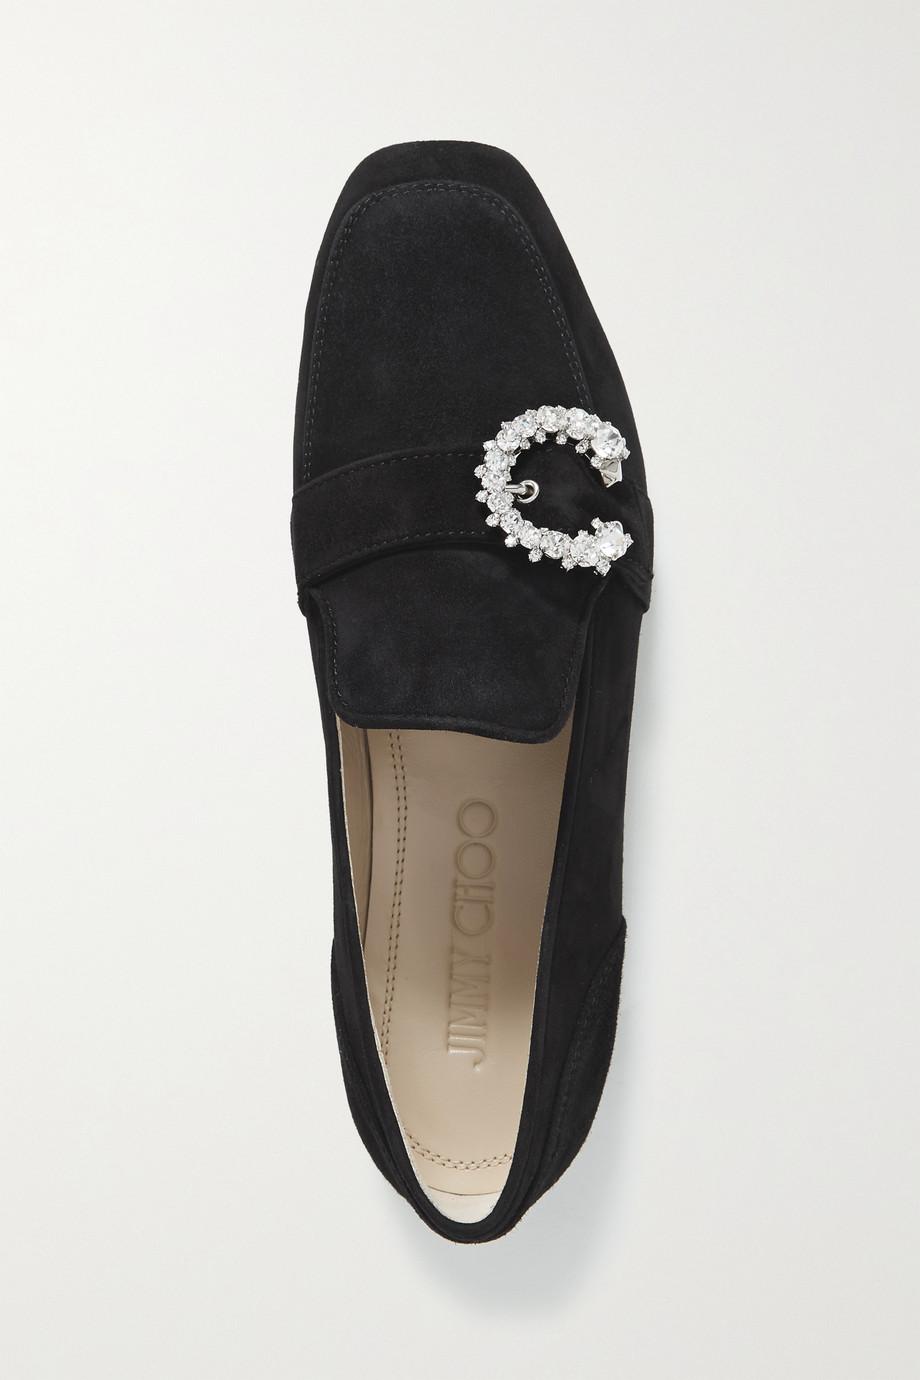 Jimmy Choo Mani crystal-embellished suede loafers